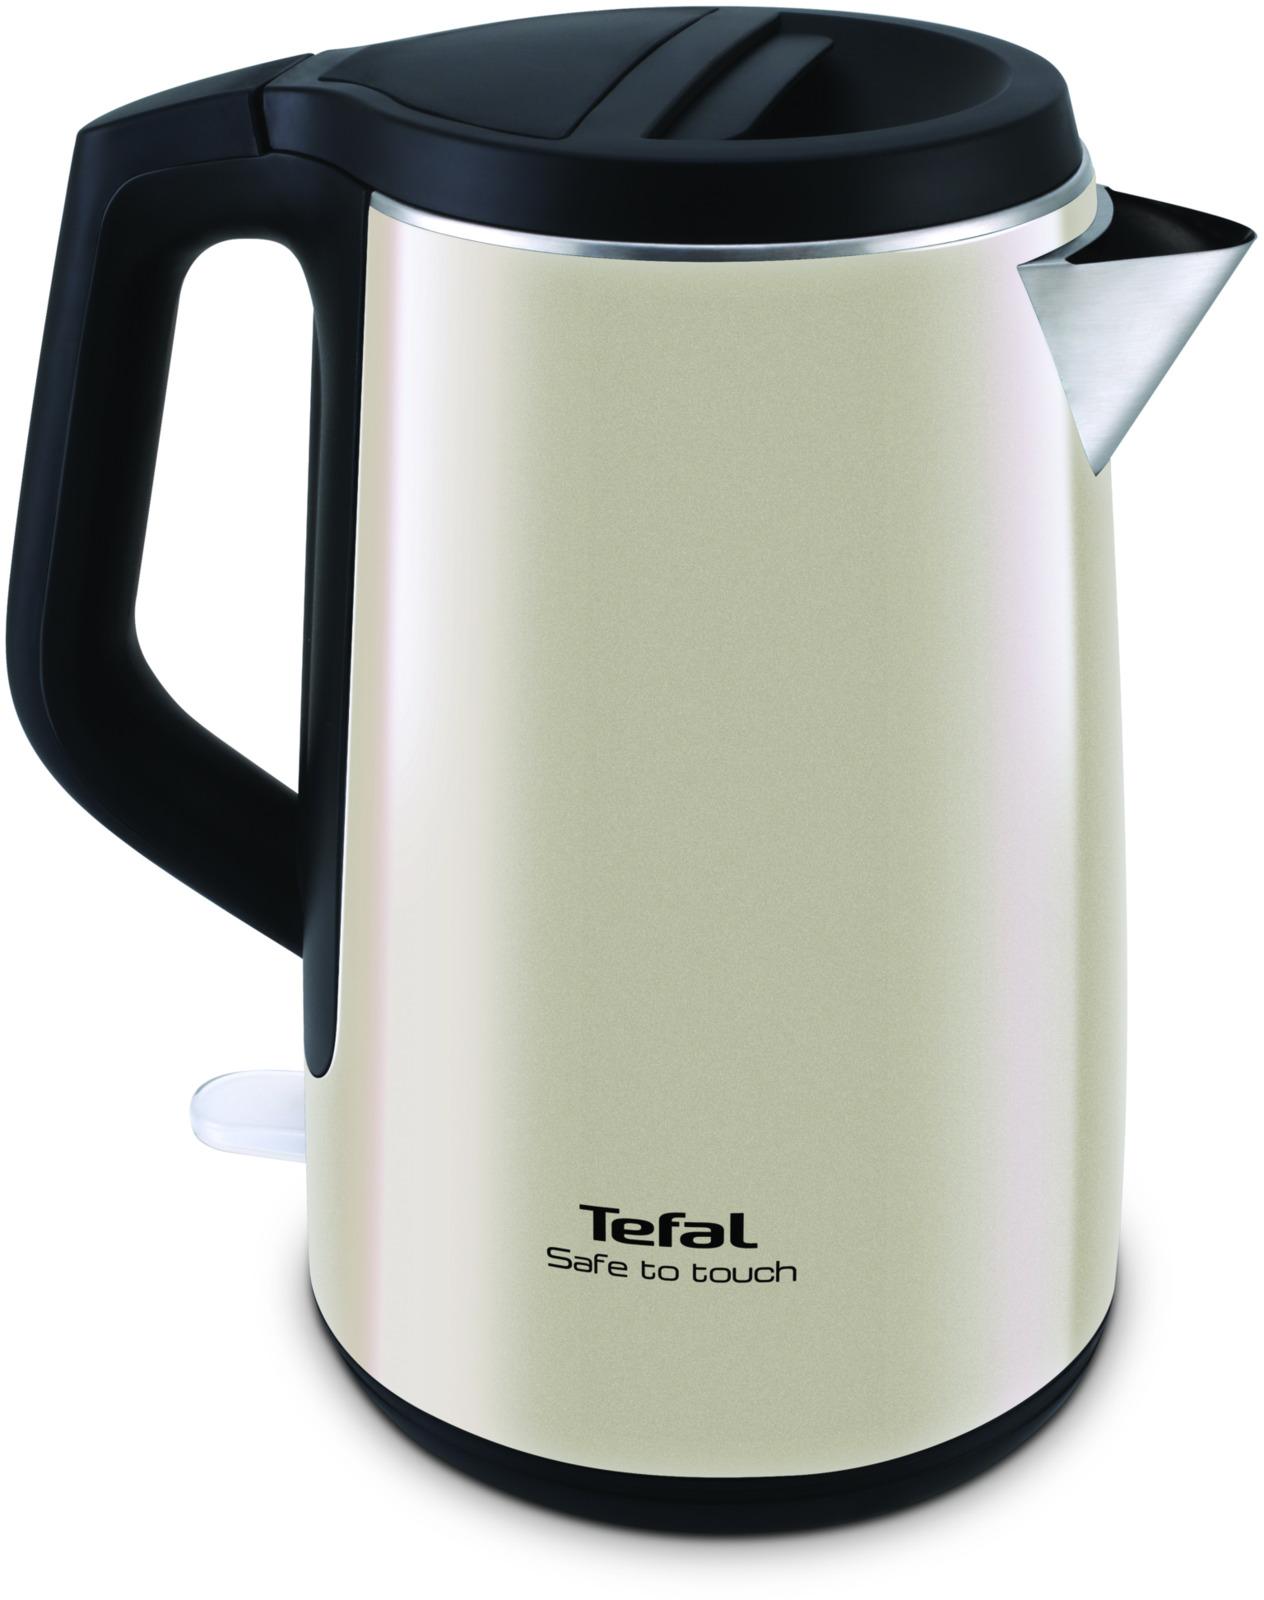 Электрический чайник Tefal KO371I30 Safe to Touch чайник tefal ko 371 safe to touch